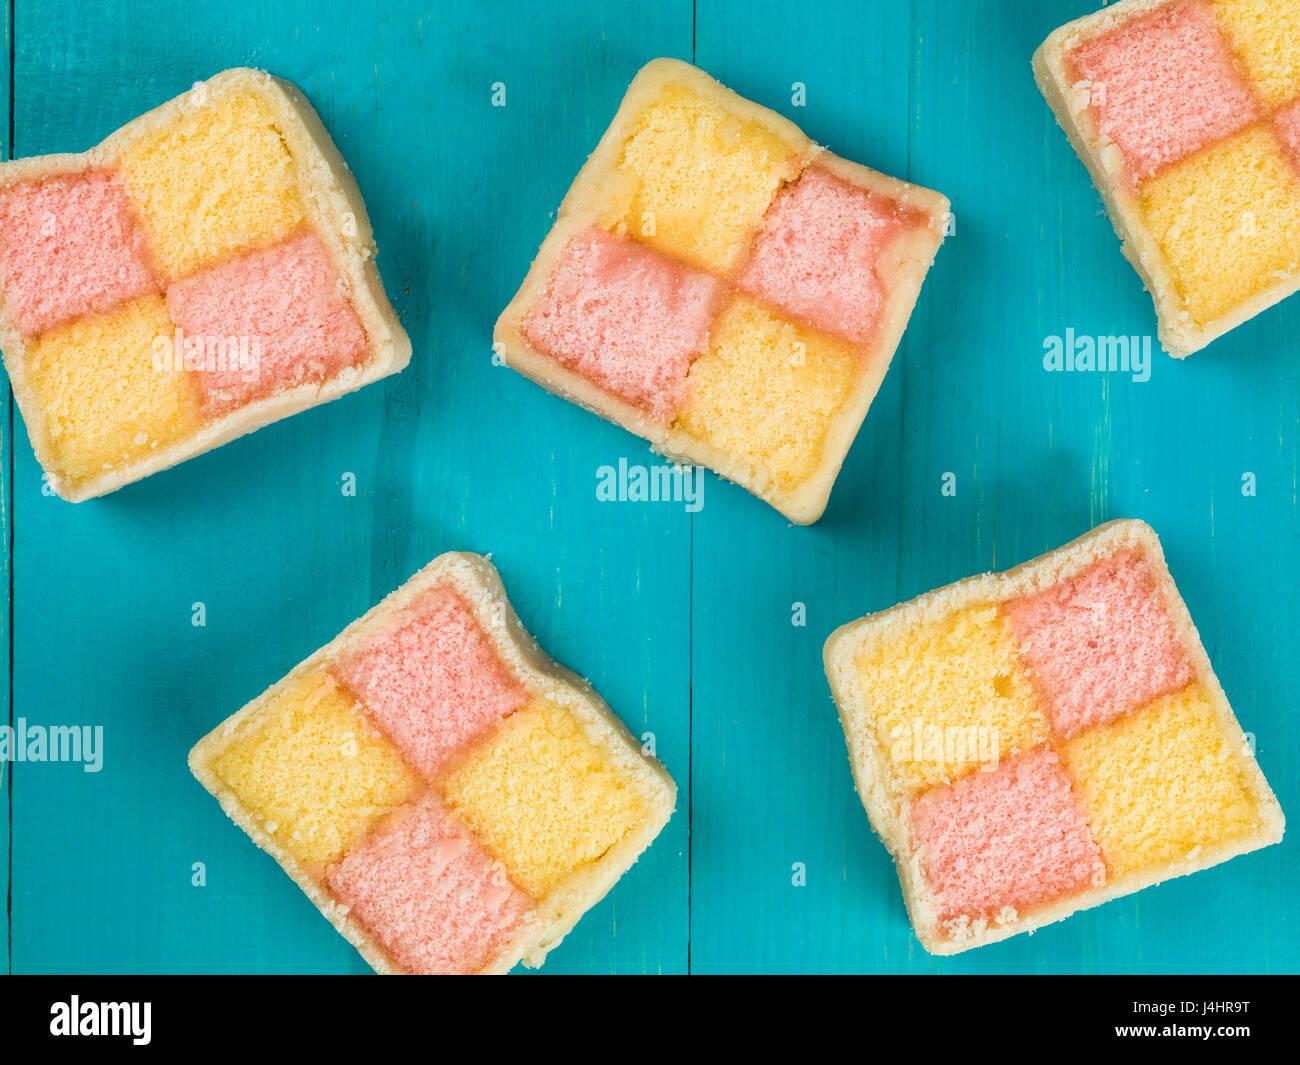 Almond Flavoured Battenberg Sponge Cake Against a Blue Background - Stock Image